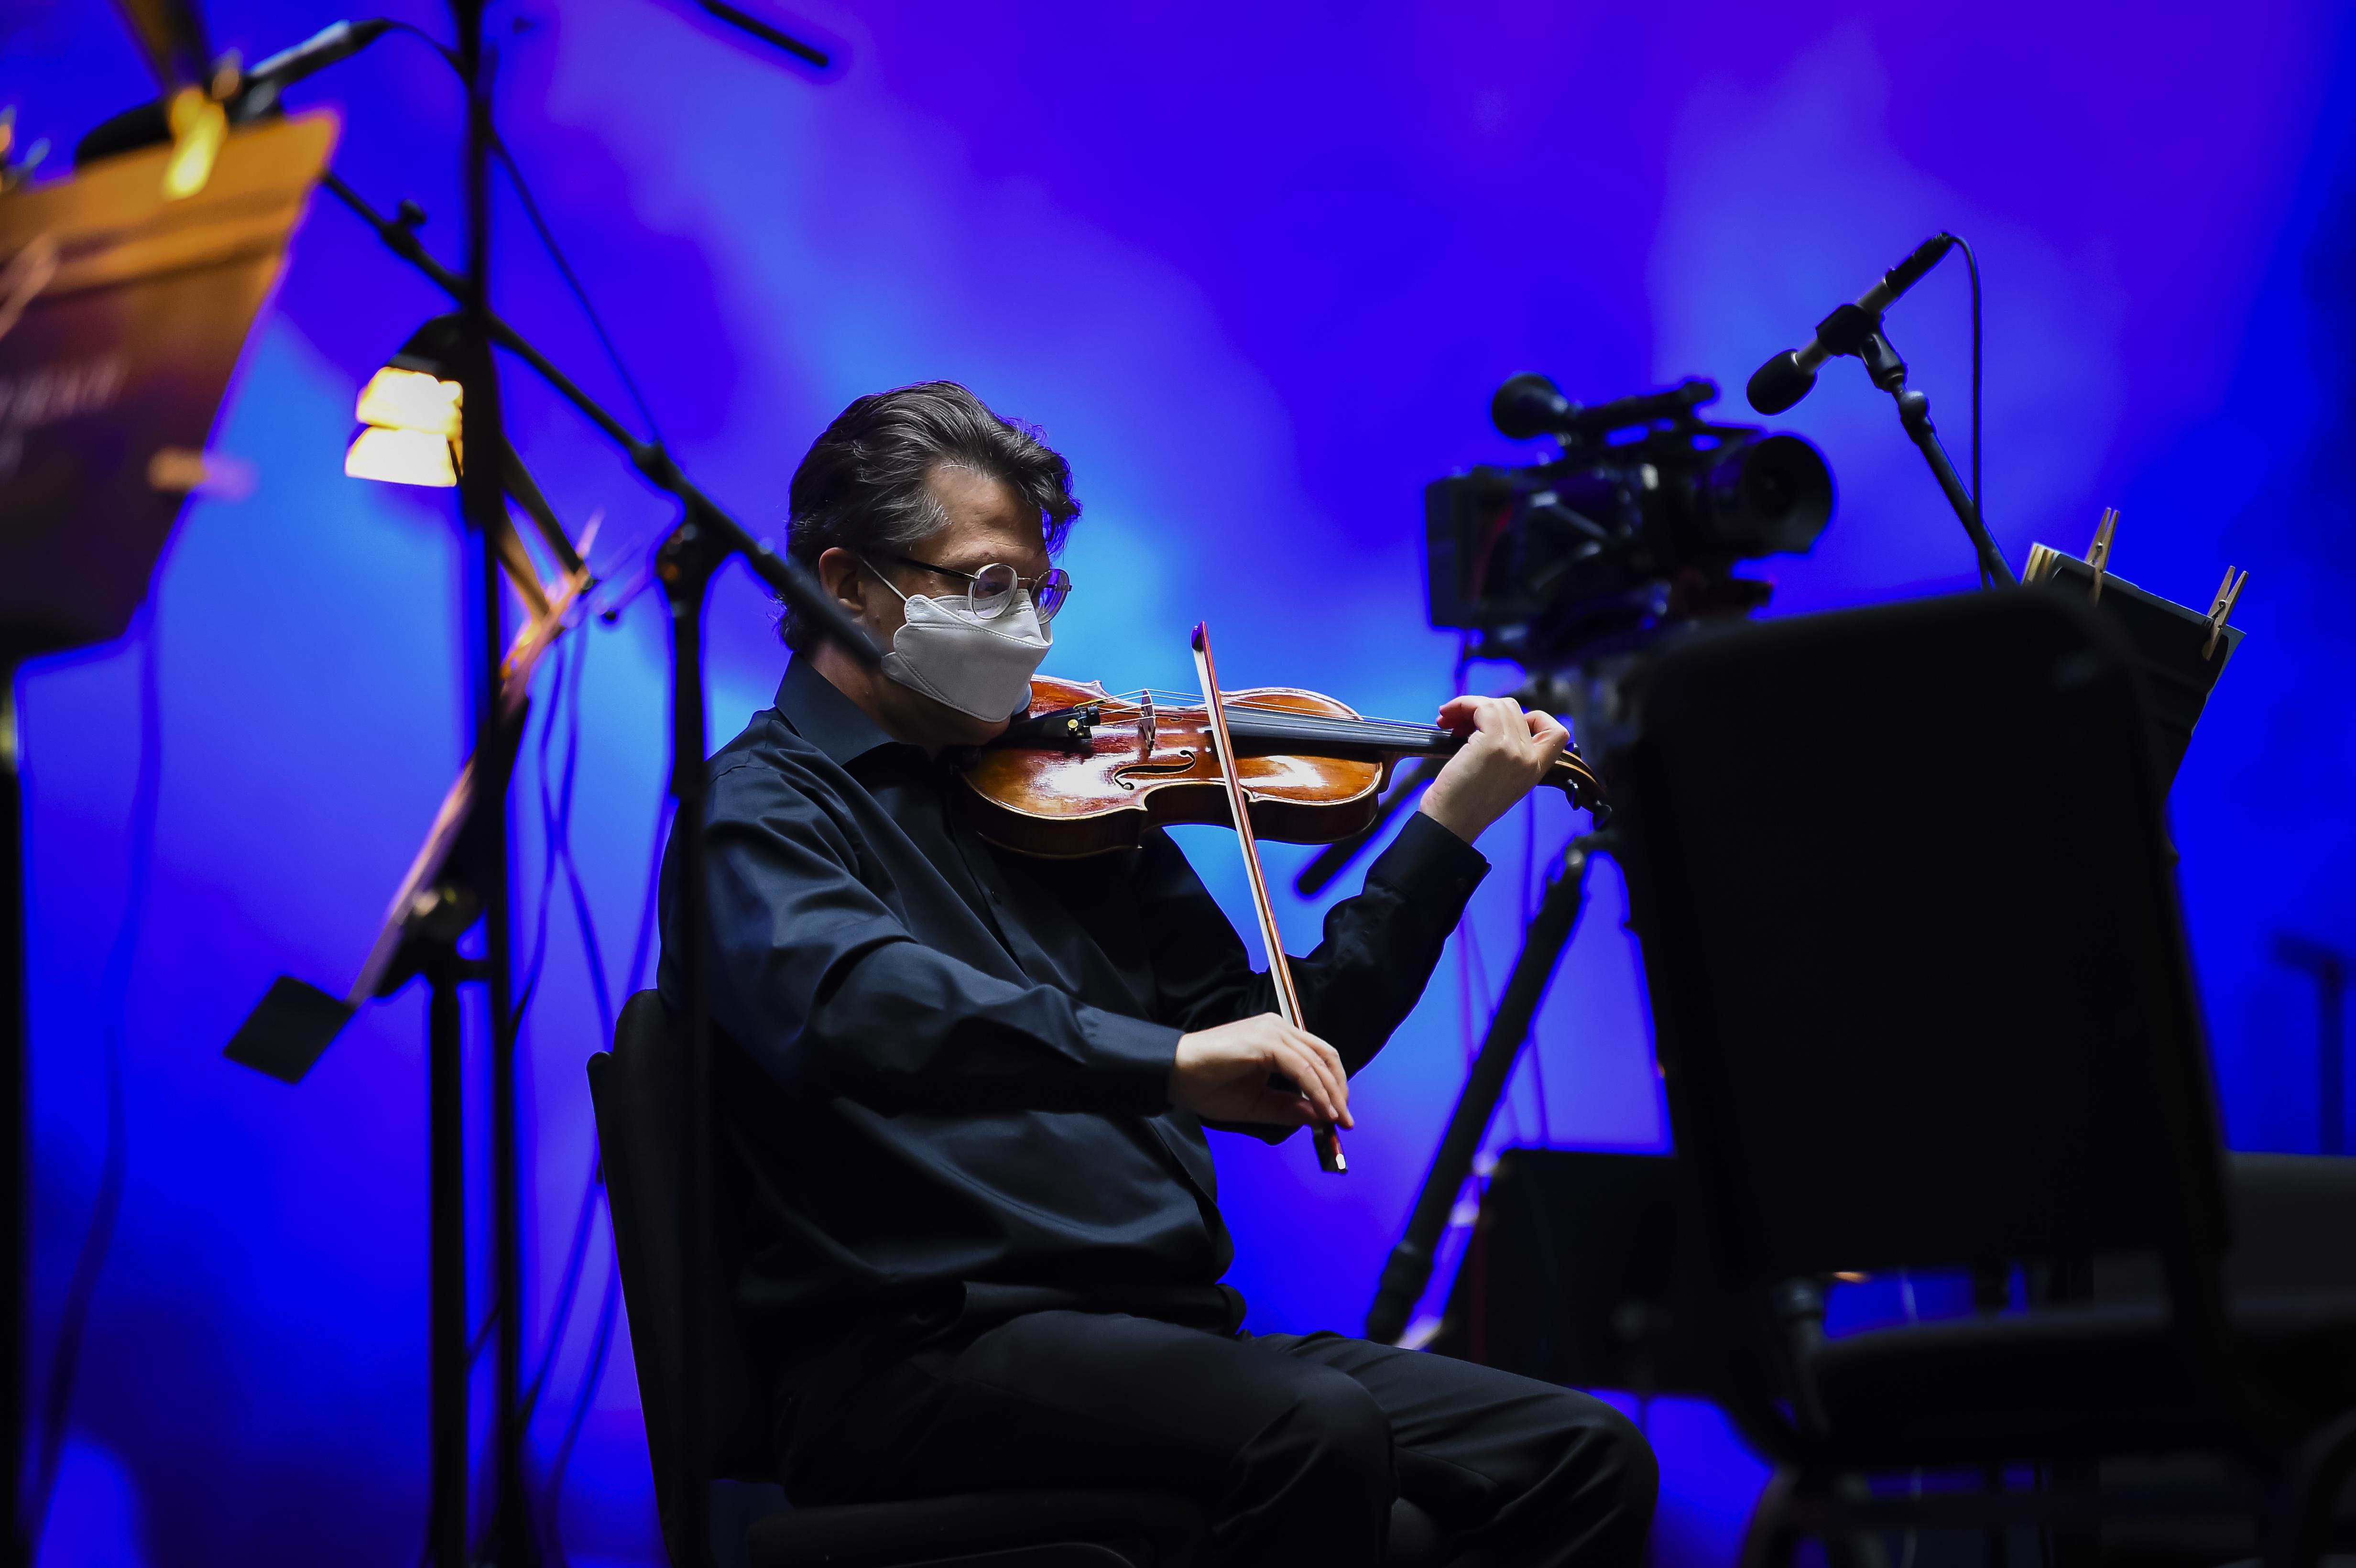 A masked violinist onstage.